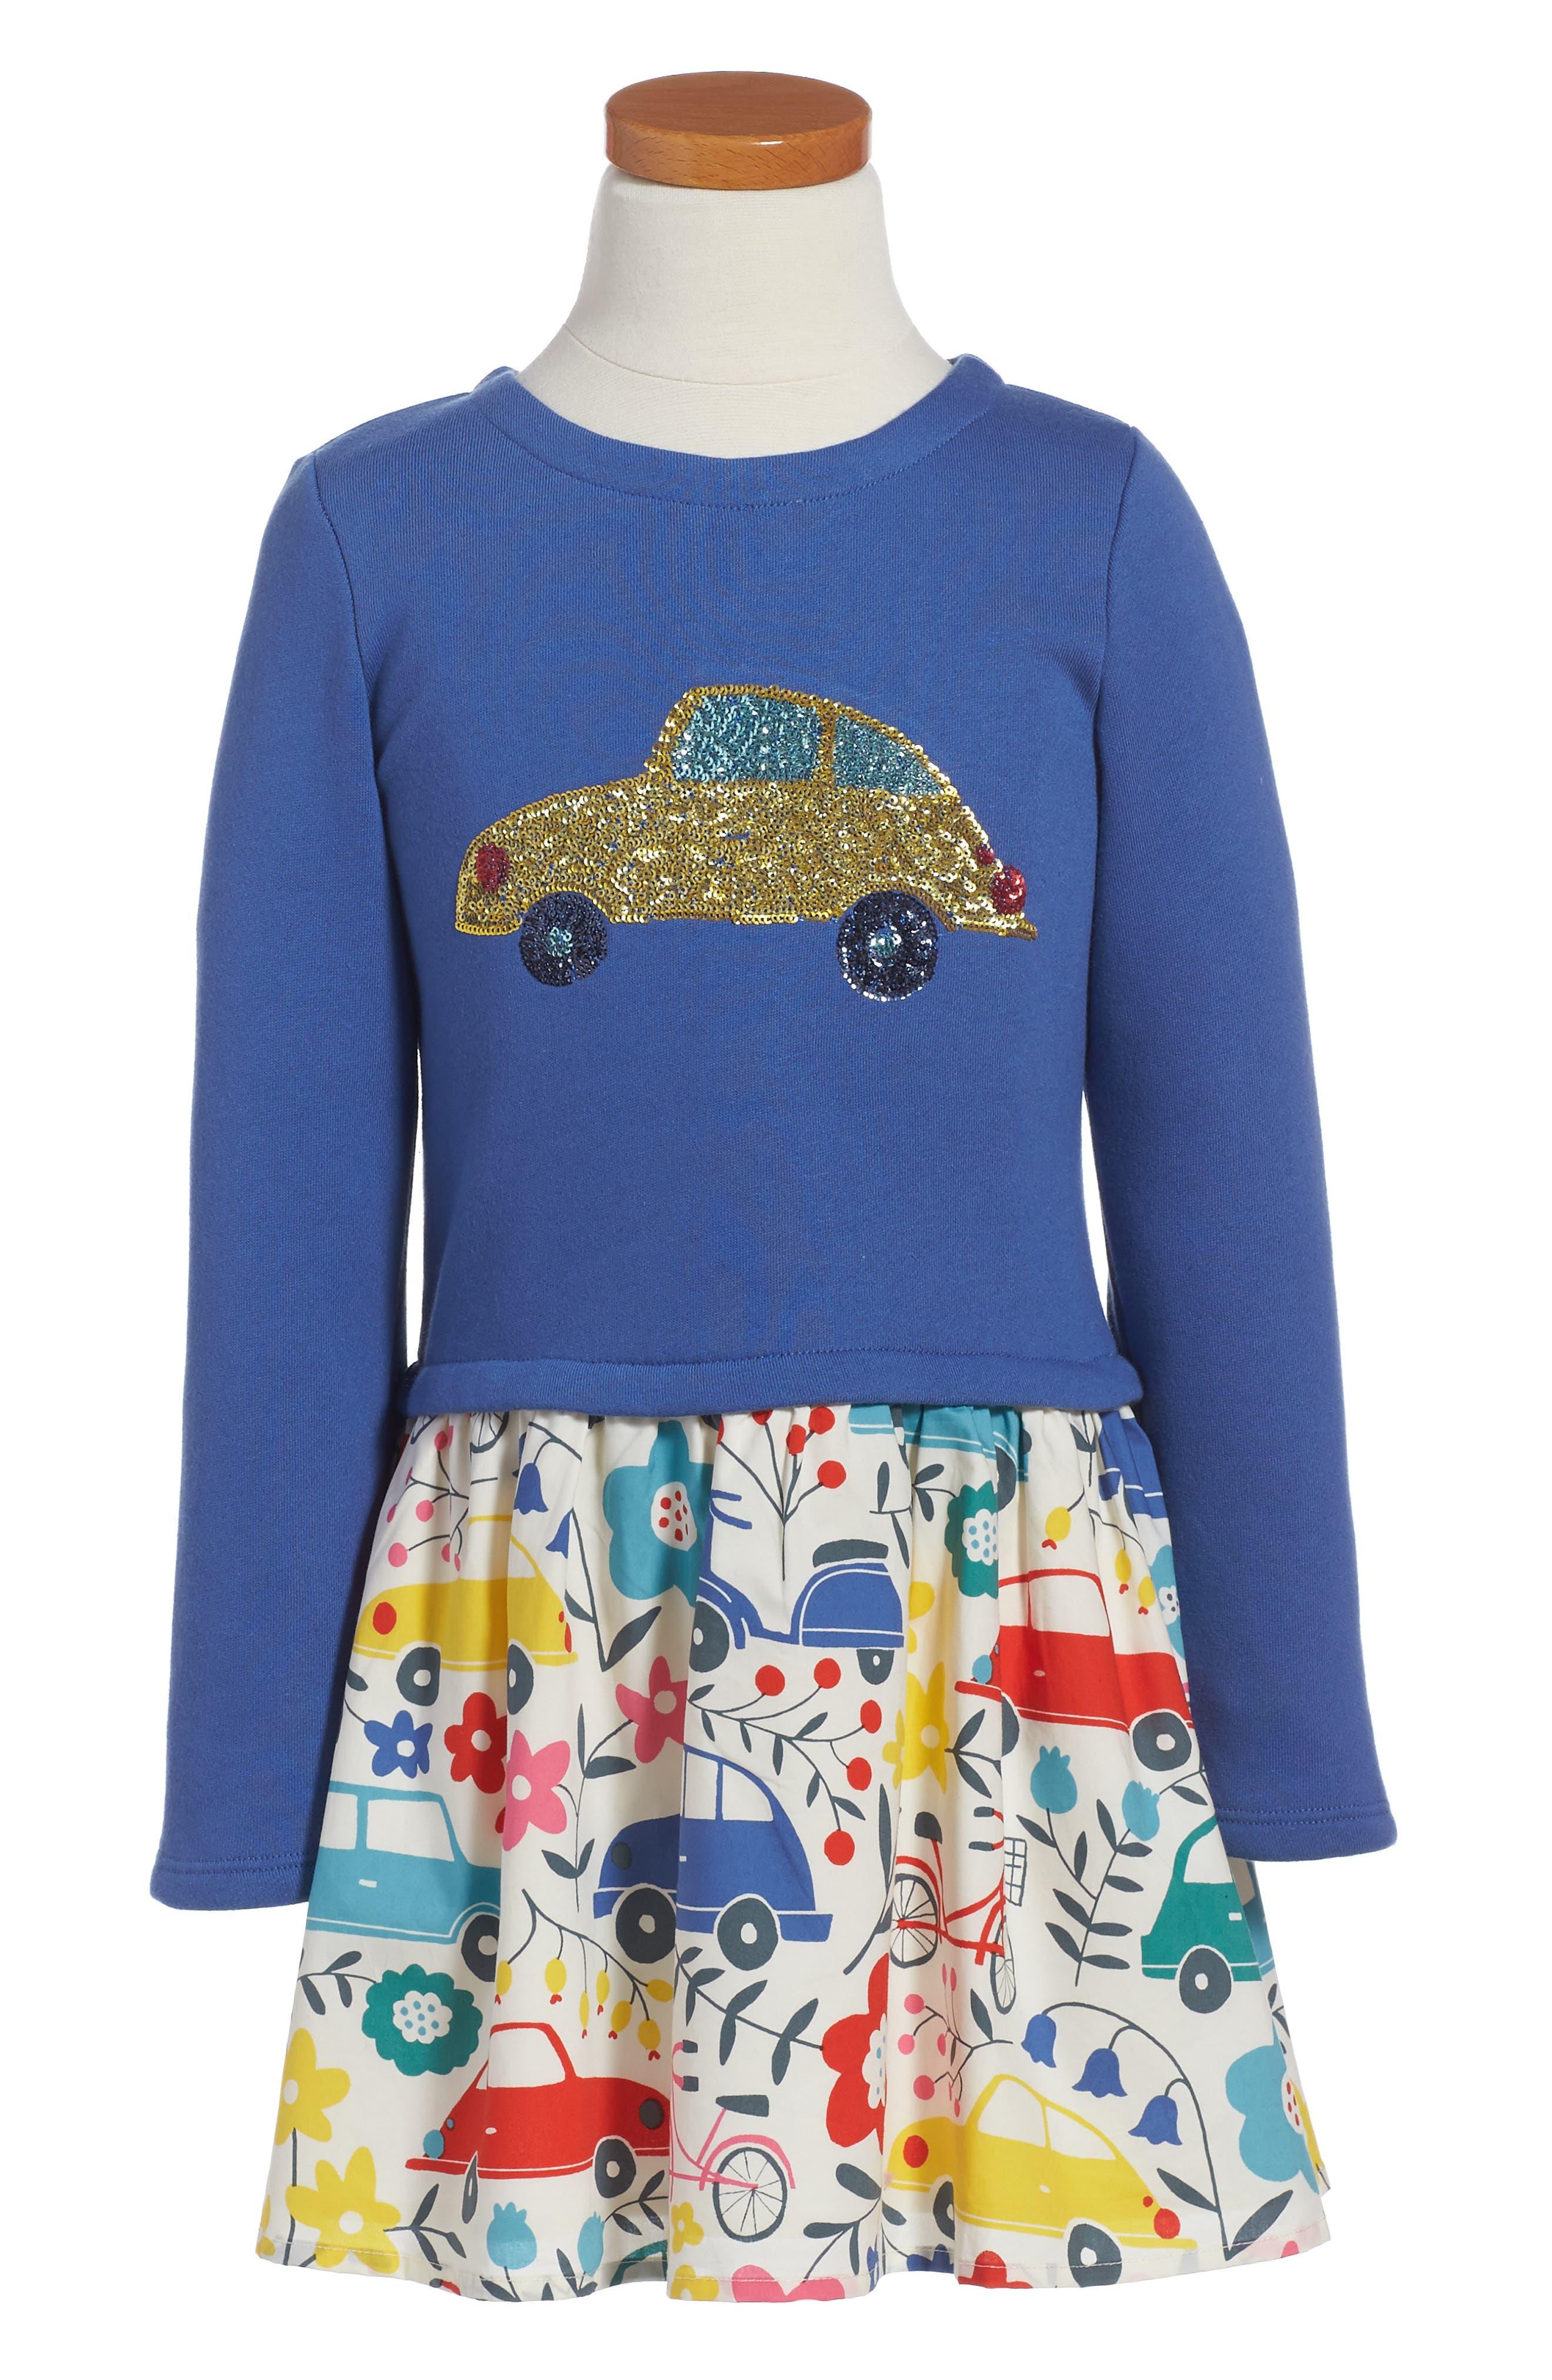 Sequin Appliqué Dress,                         Main,                         color, Bluebell